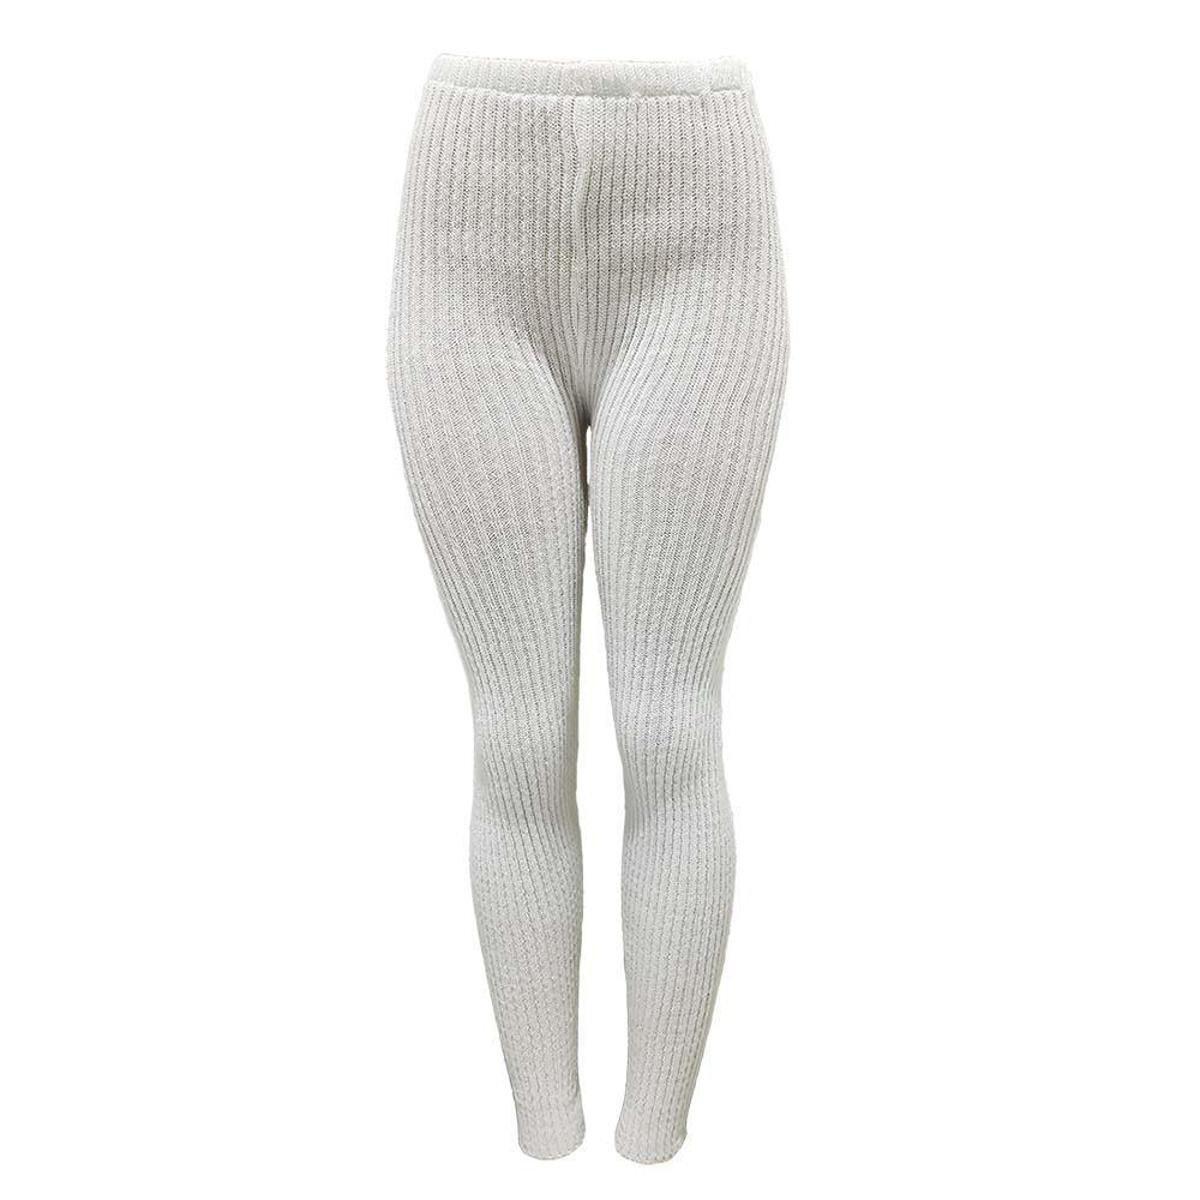 Calça Fuso Katlen Tricot Canelado Feminina - Branco